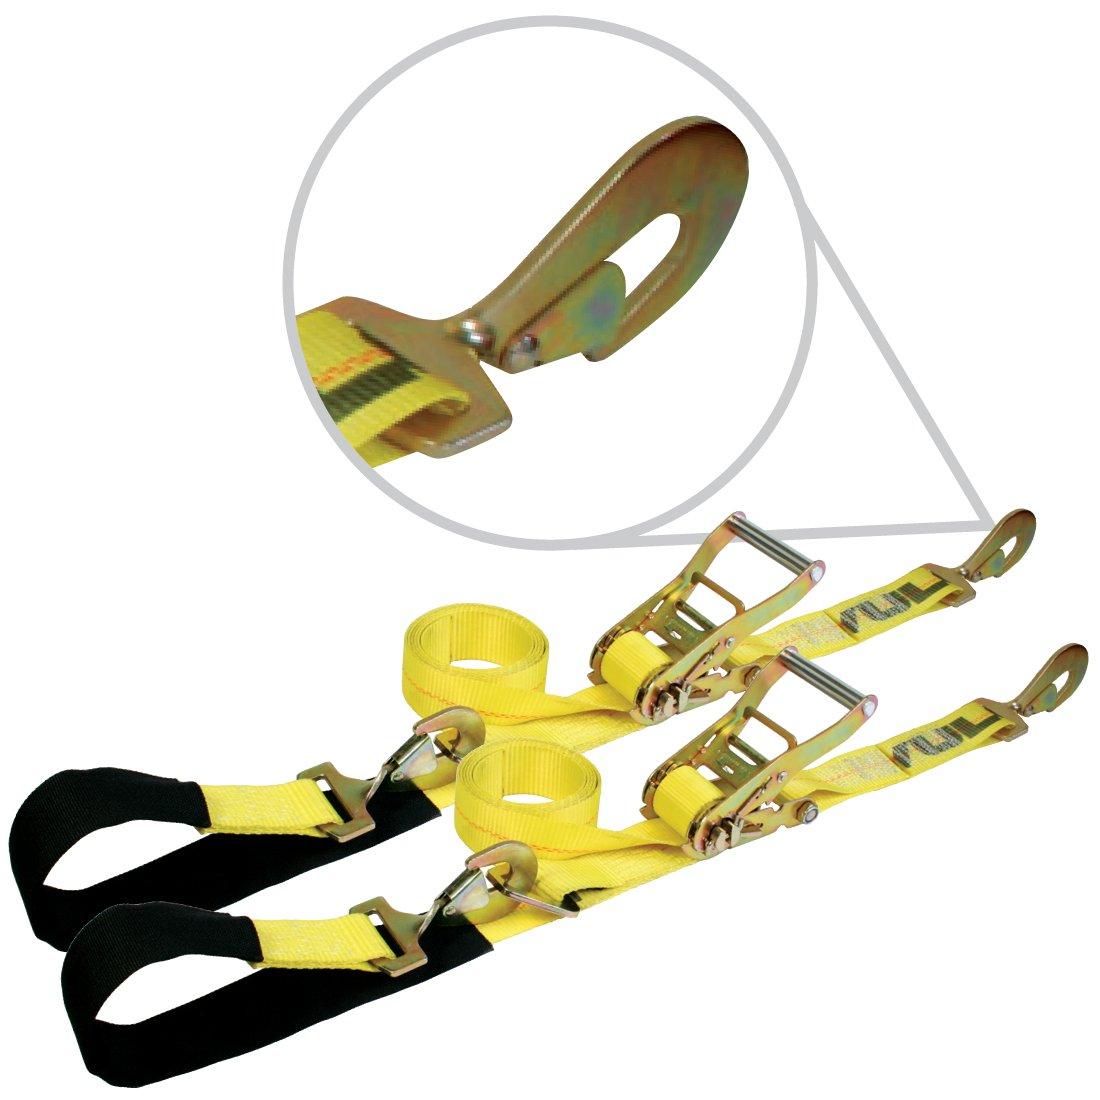 Vulcan Classic Yellow Series 2'' Axle Tie Down Combo Strap Kit